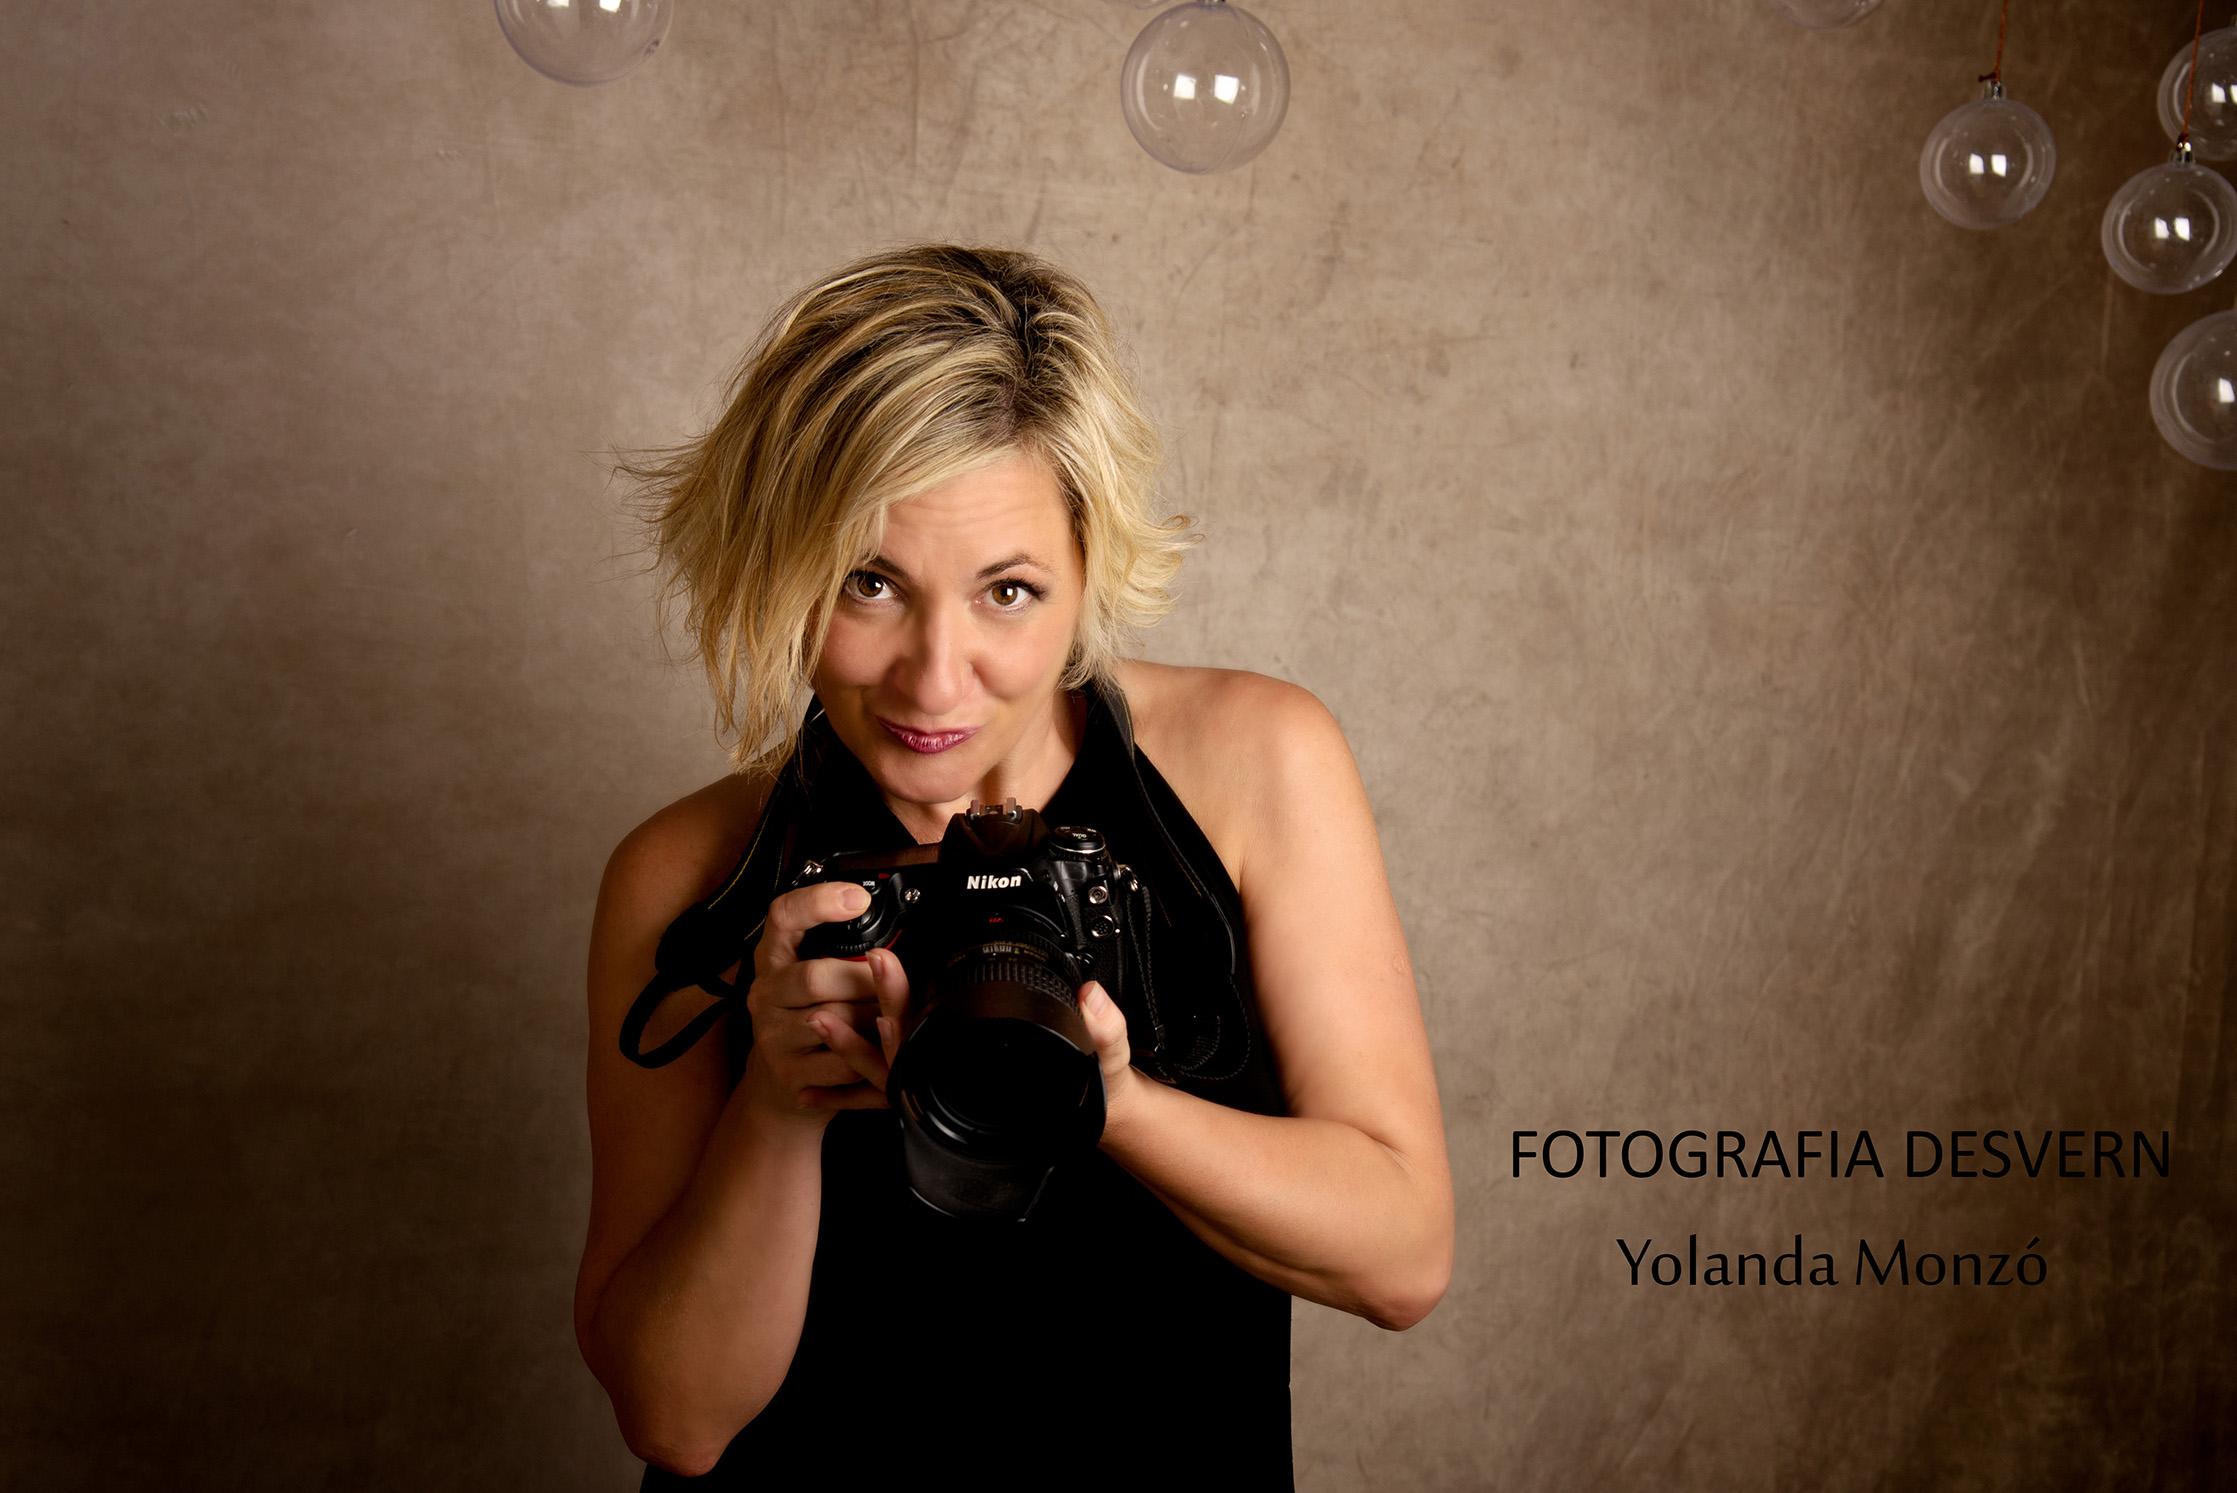 Fotografia Desvern: Yolanda Monzó